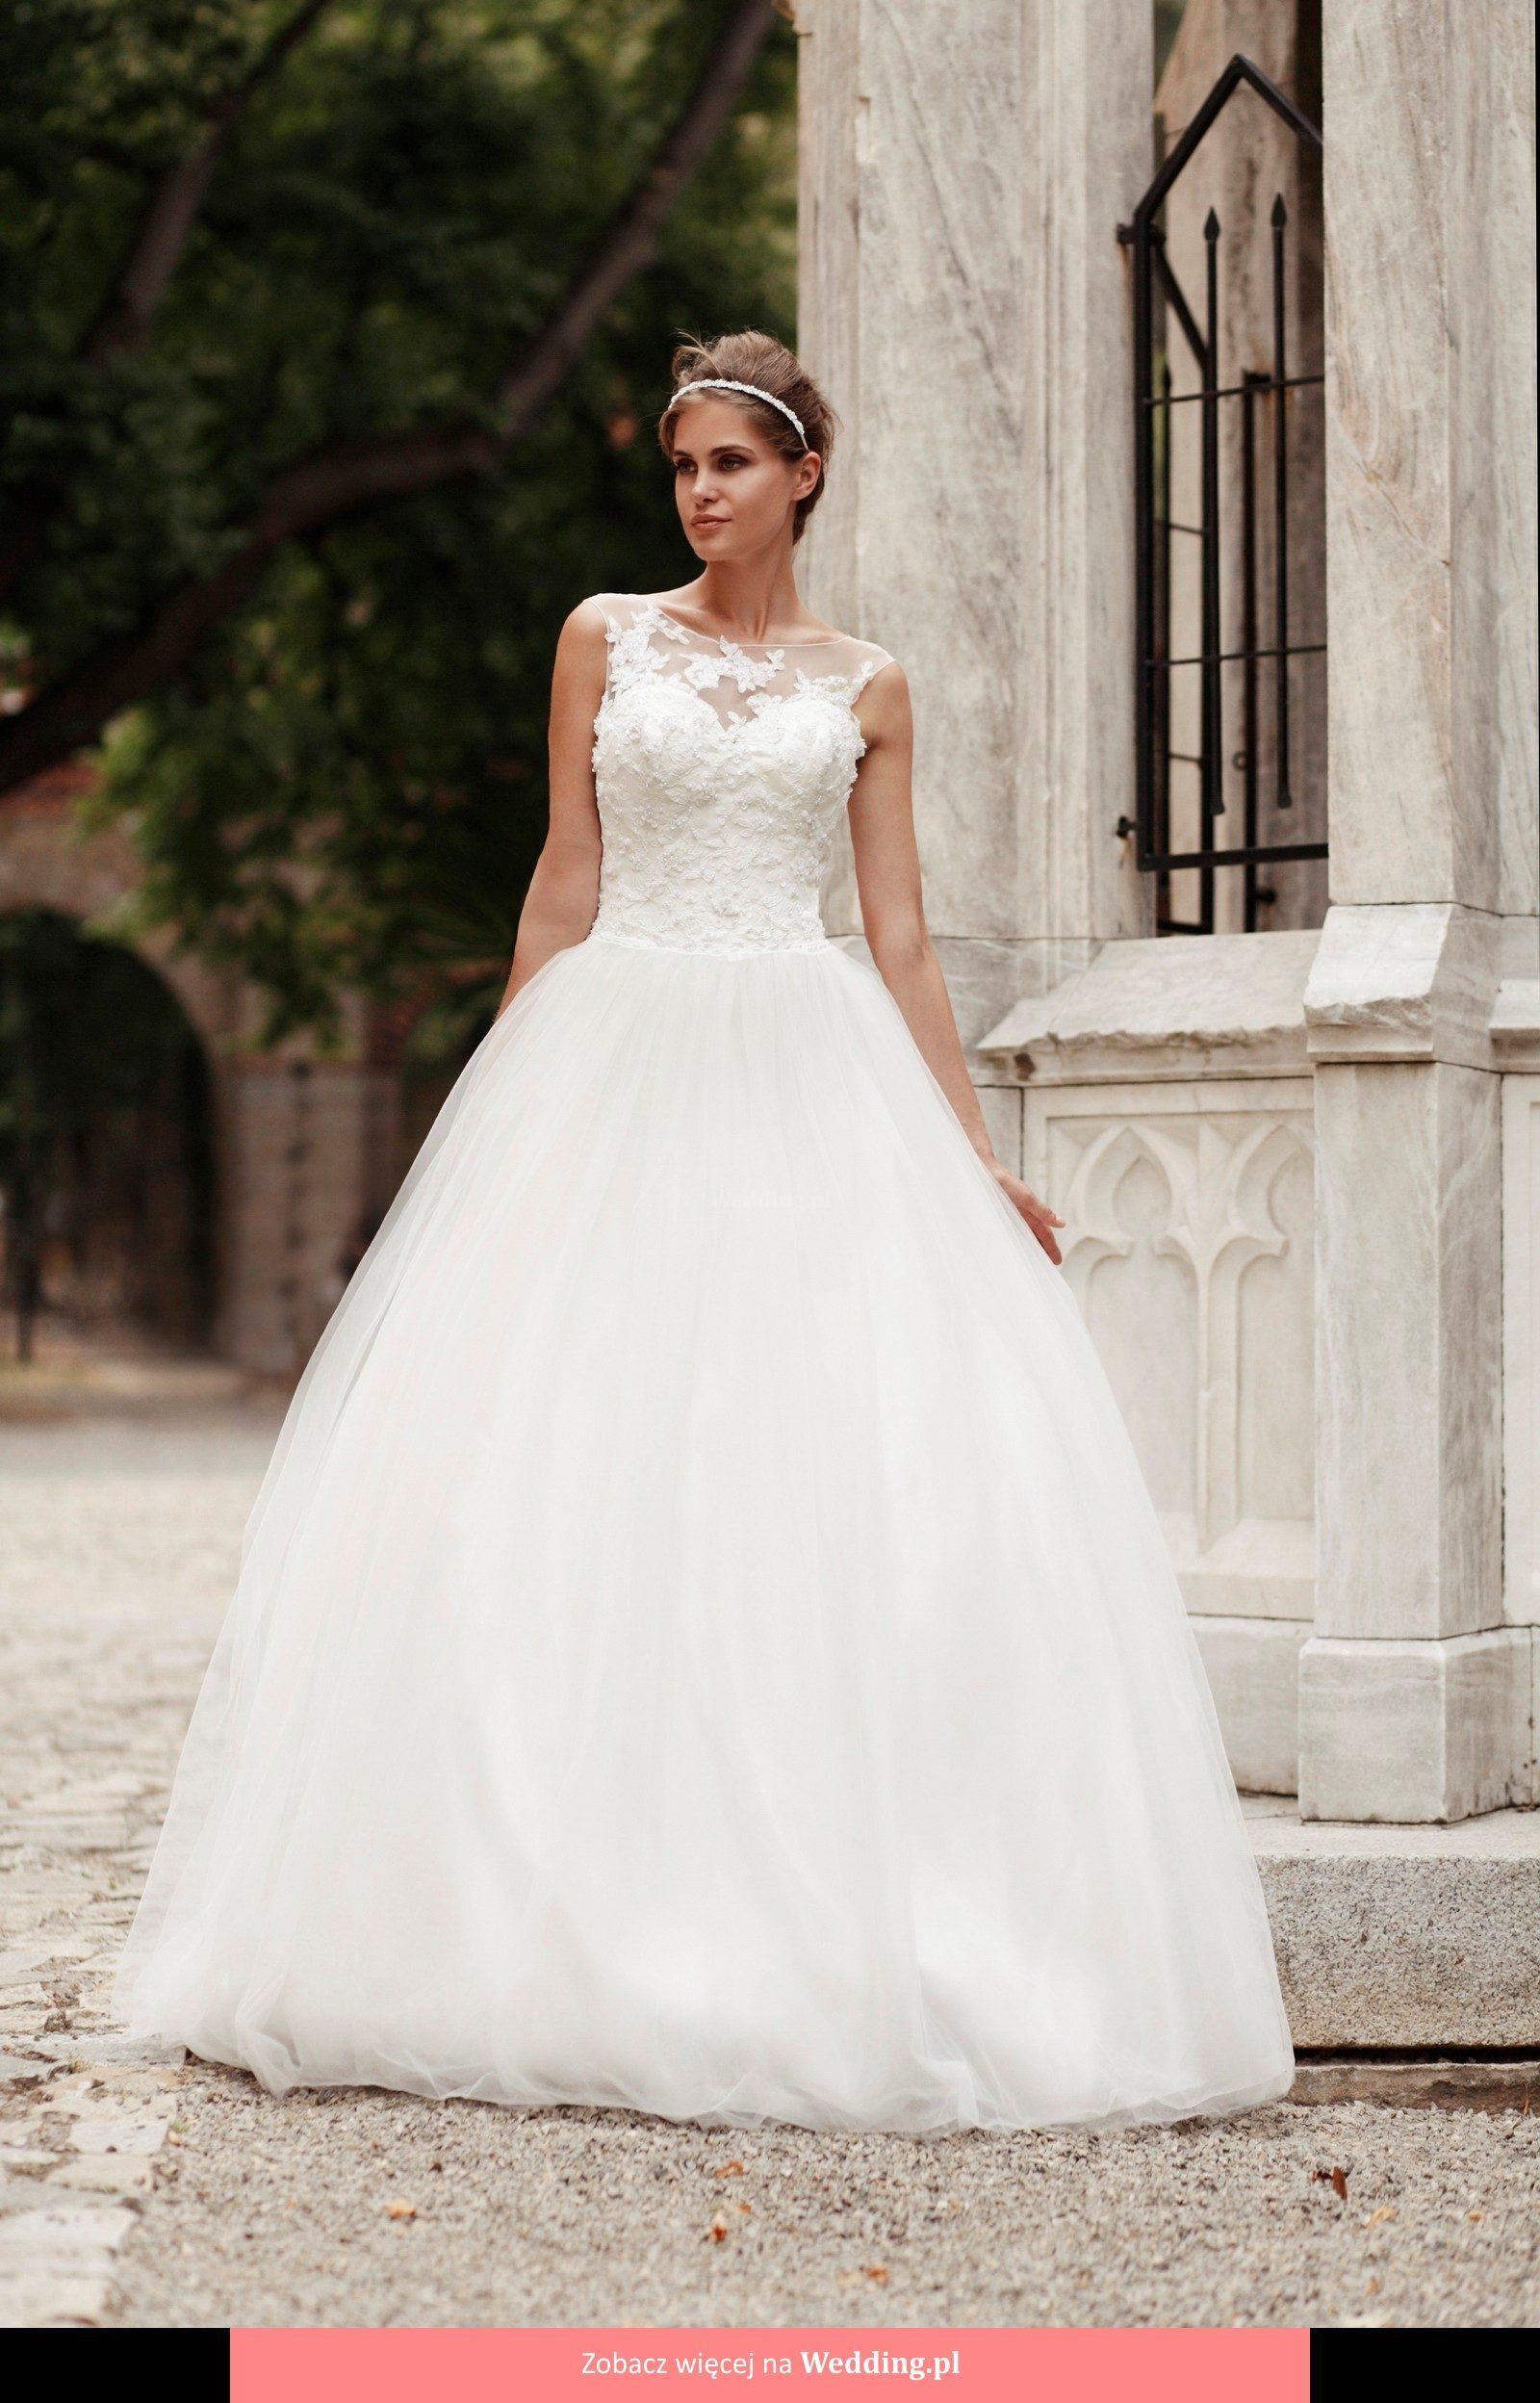 Suknia ślubna Xs Annais Bridal Ambrosia 1607 7280788284